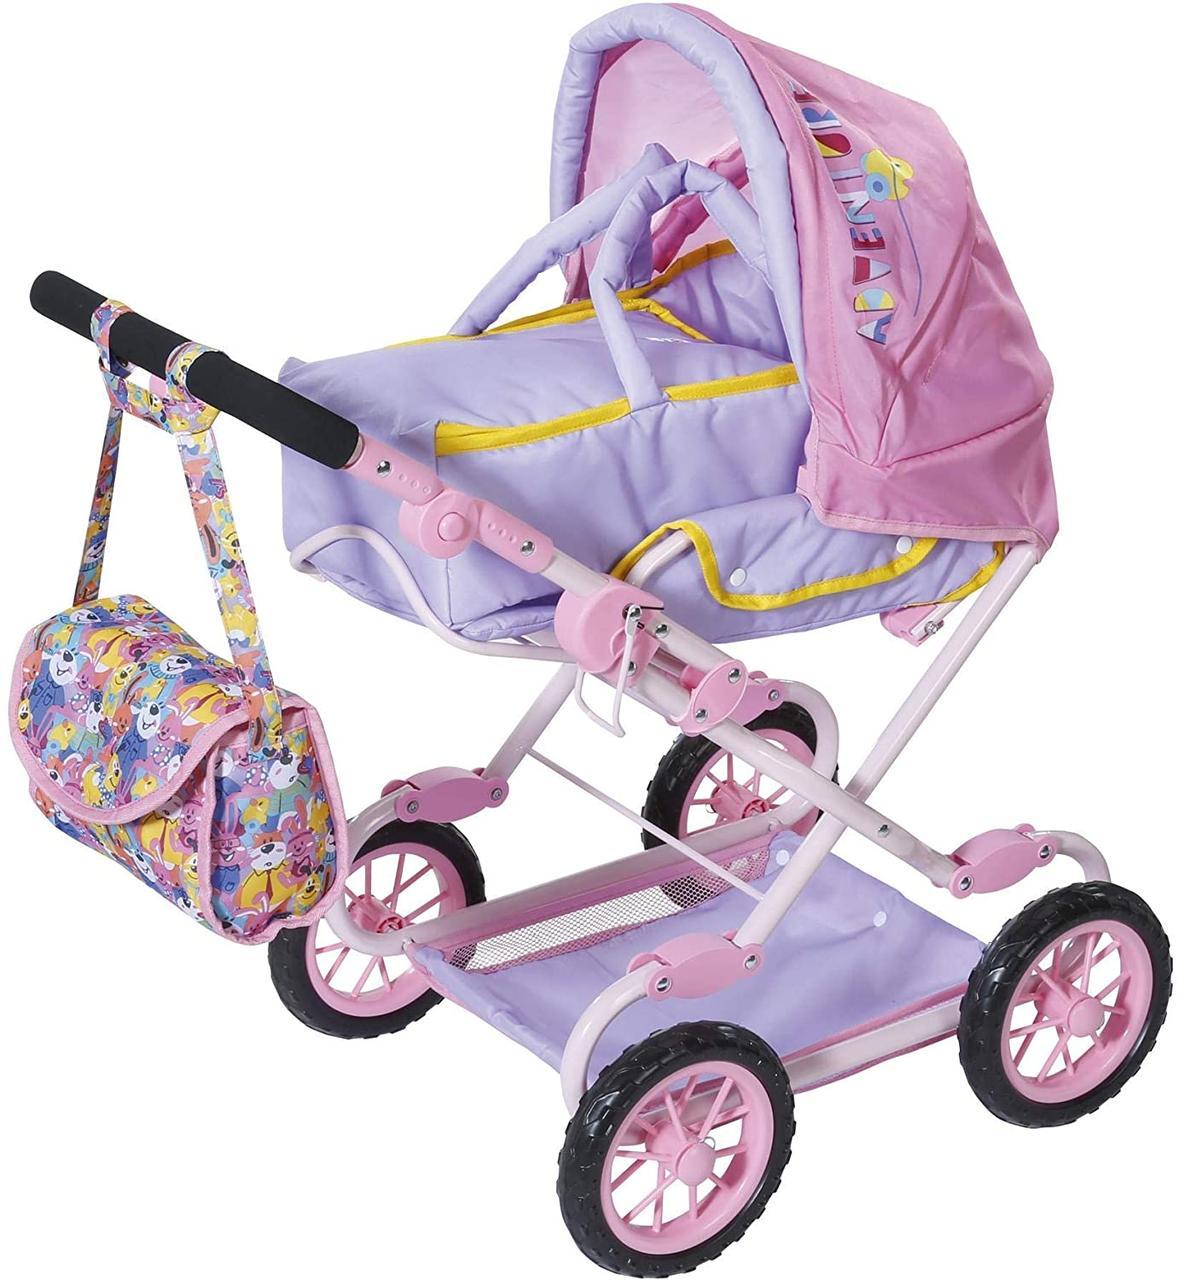 Коляска куклы Беби Борн Baby Born делюкс Zapf Creation 828649